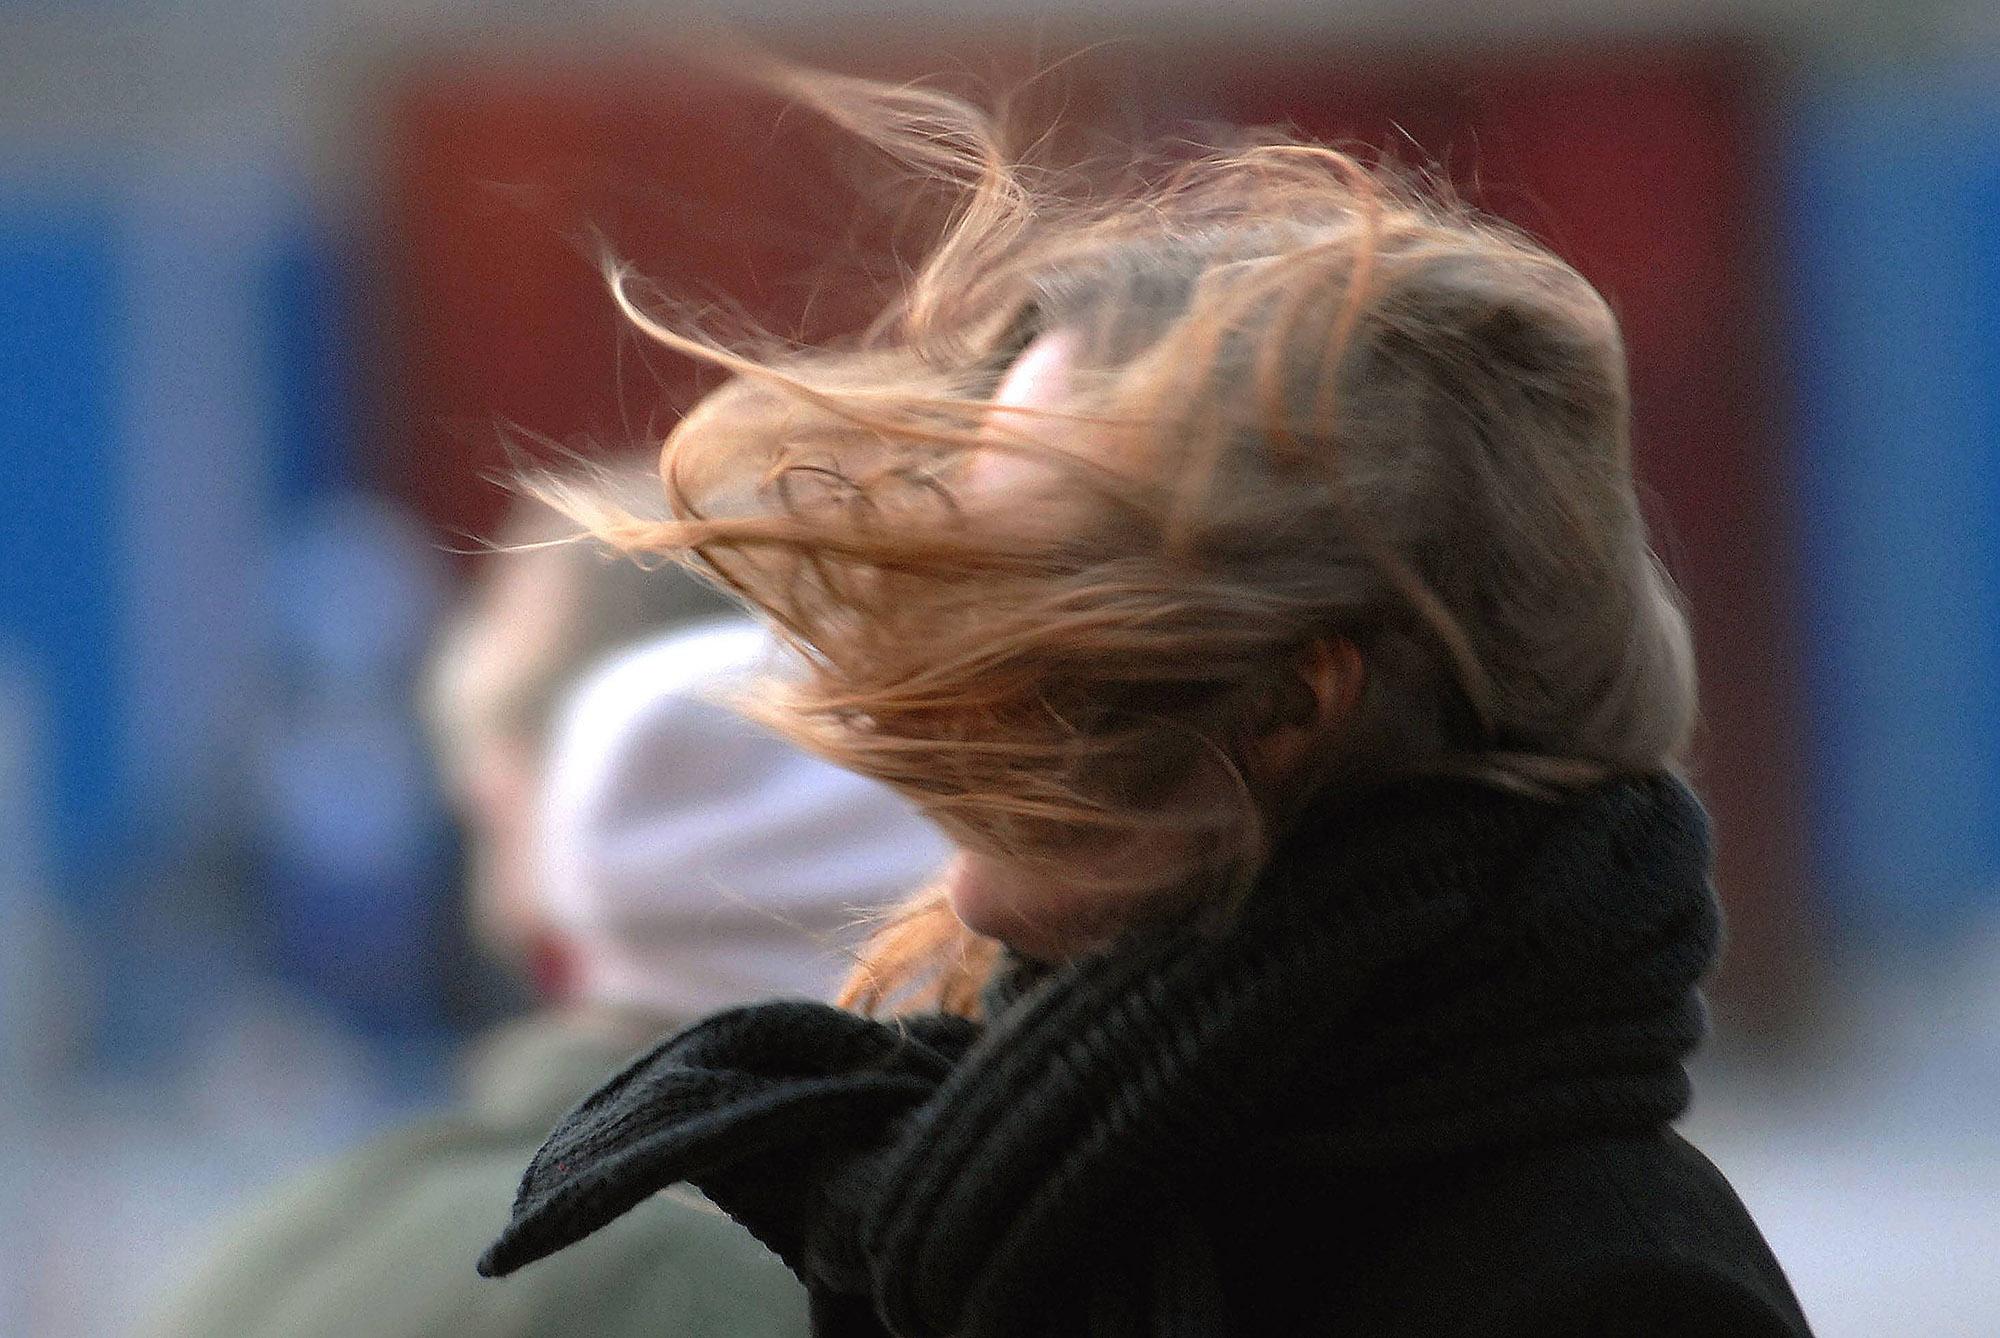 Sturmboeen, Regen und Temperaturrueckgang am Wochenende angekuendigt. *** Sturmboeen Rain and at Weekend angekuendigt